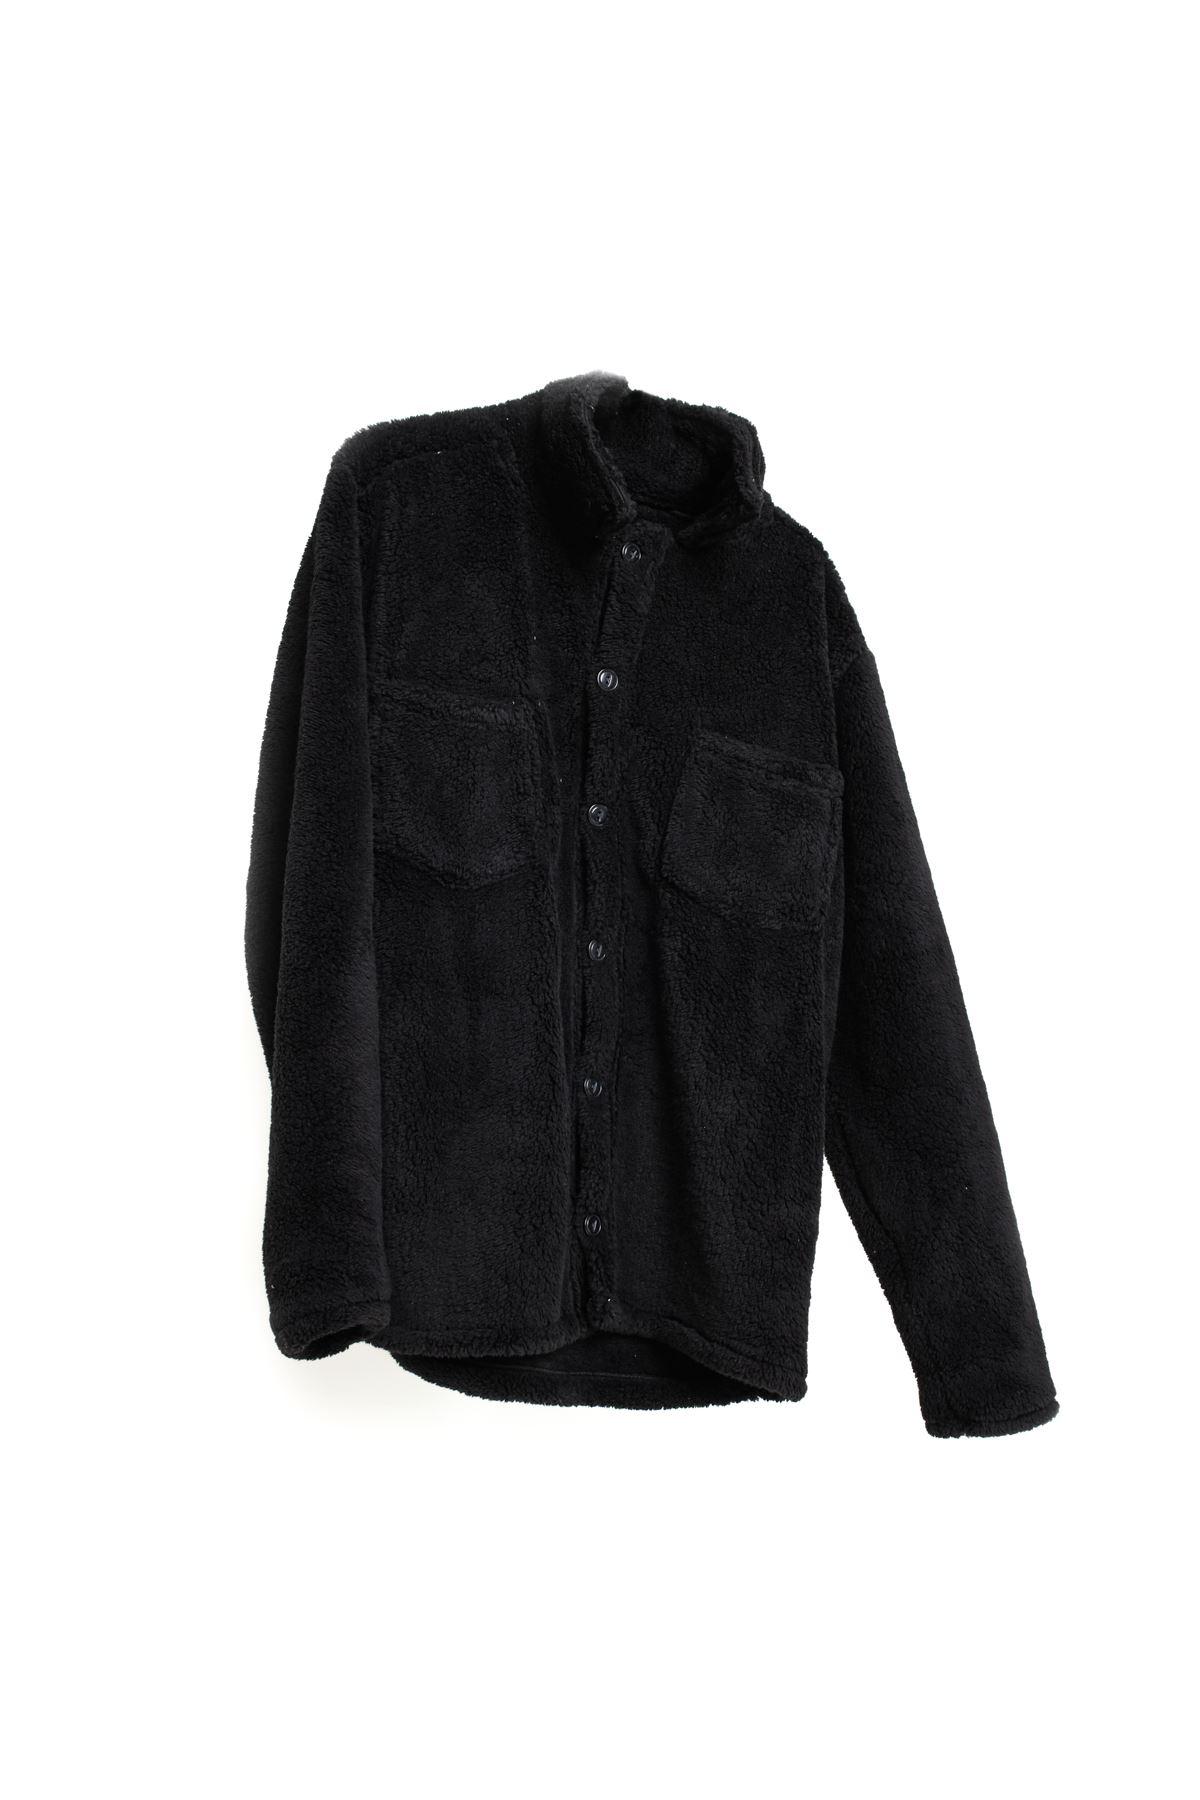 Siyah Pelüş Gömlek